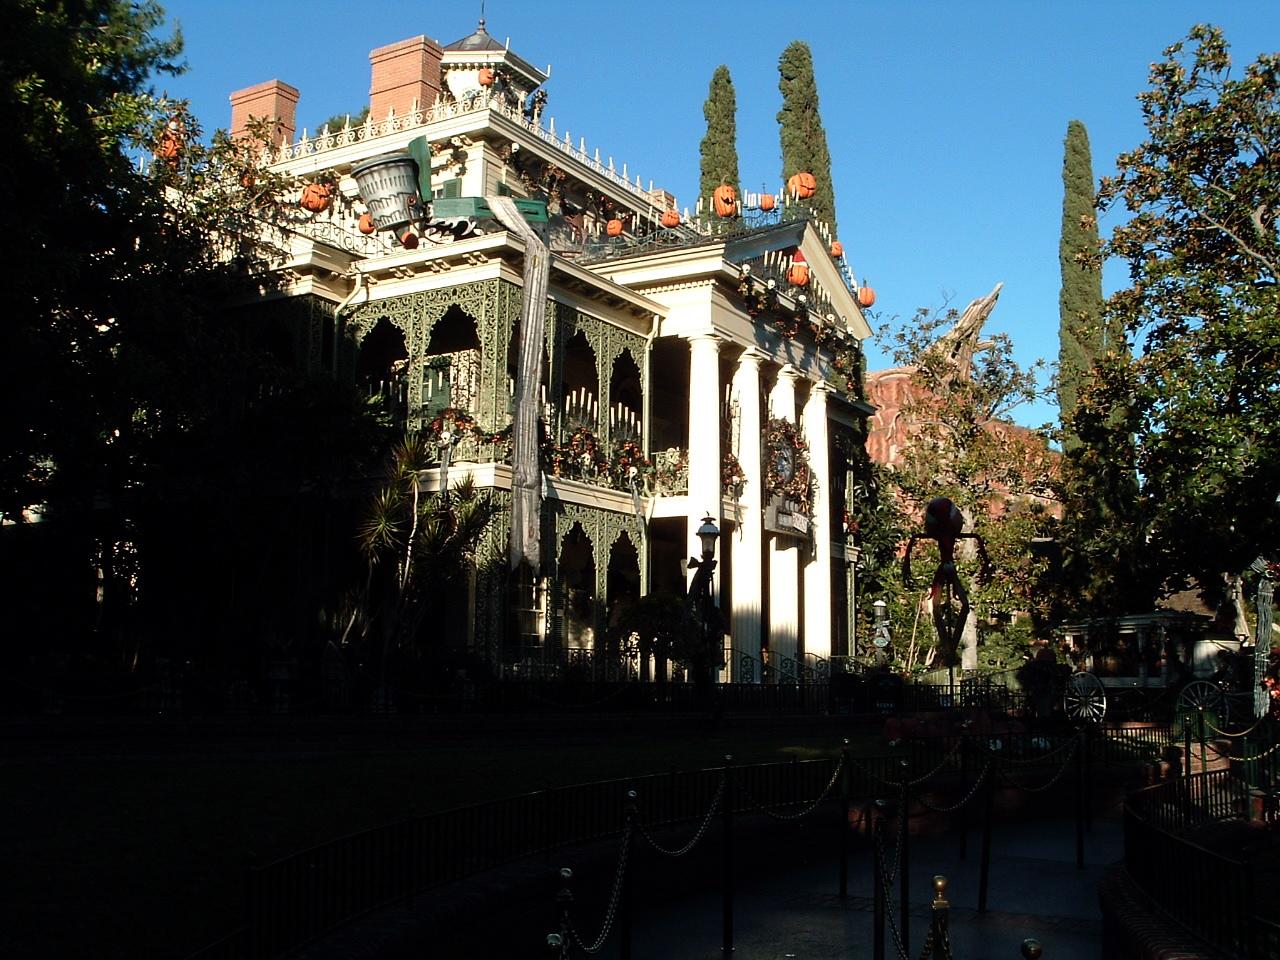 Haunted Mansion Holiday Exterior.JPG